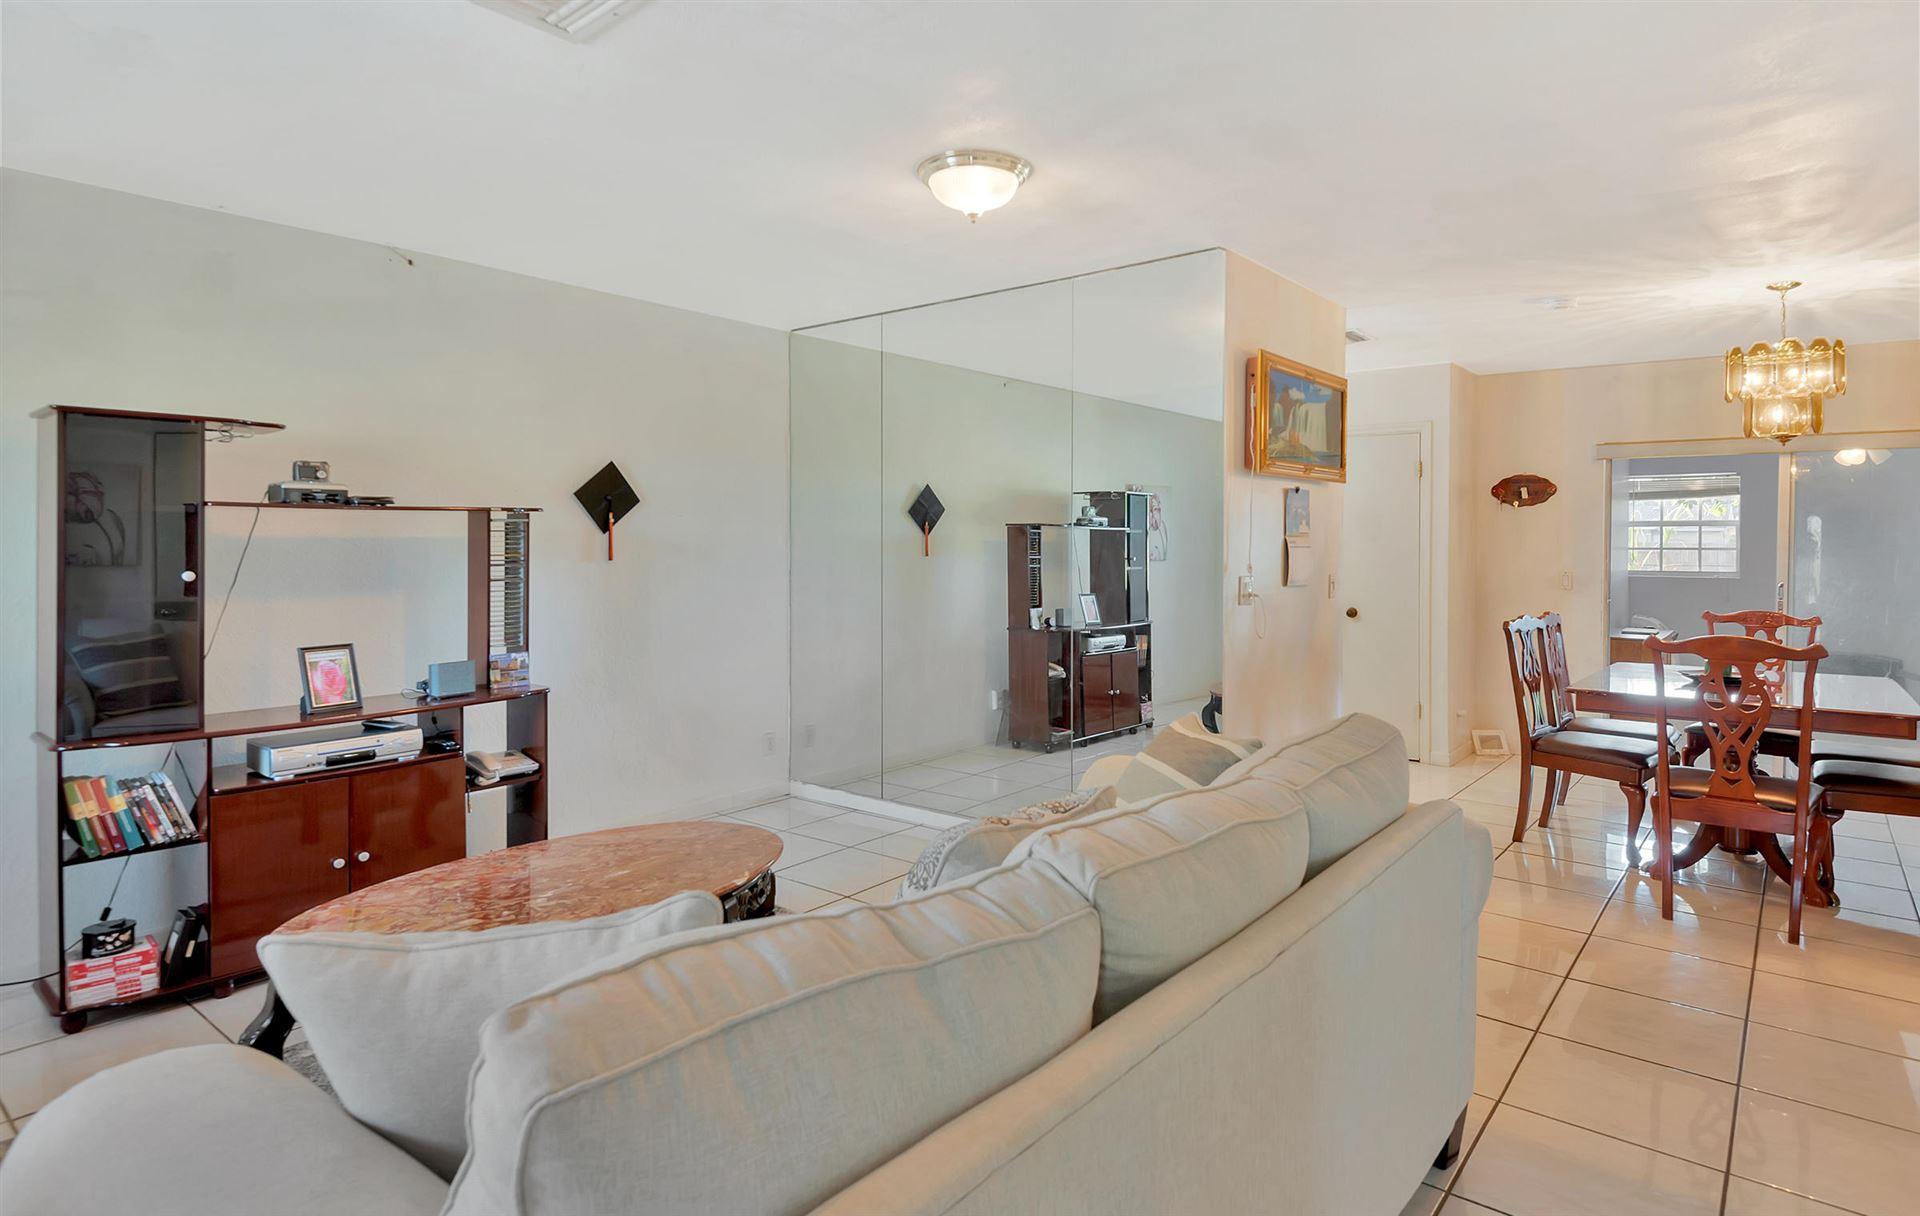 Photo of 377 Foresta Terrace Terrace, West Palm Beach, FL 33415 (MLS # RX-10686699)